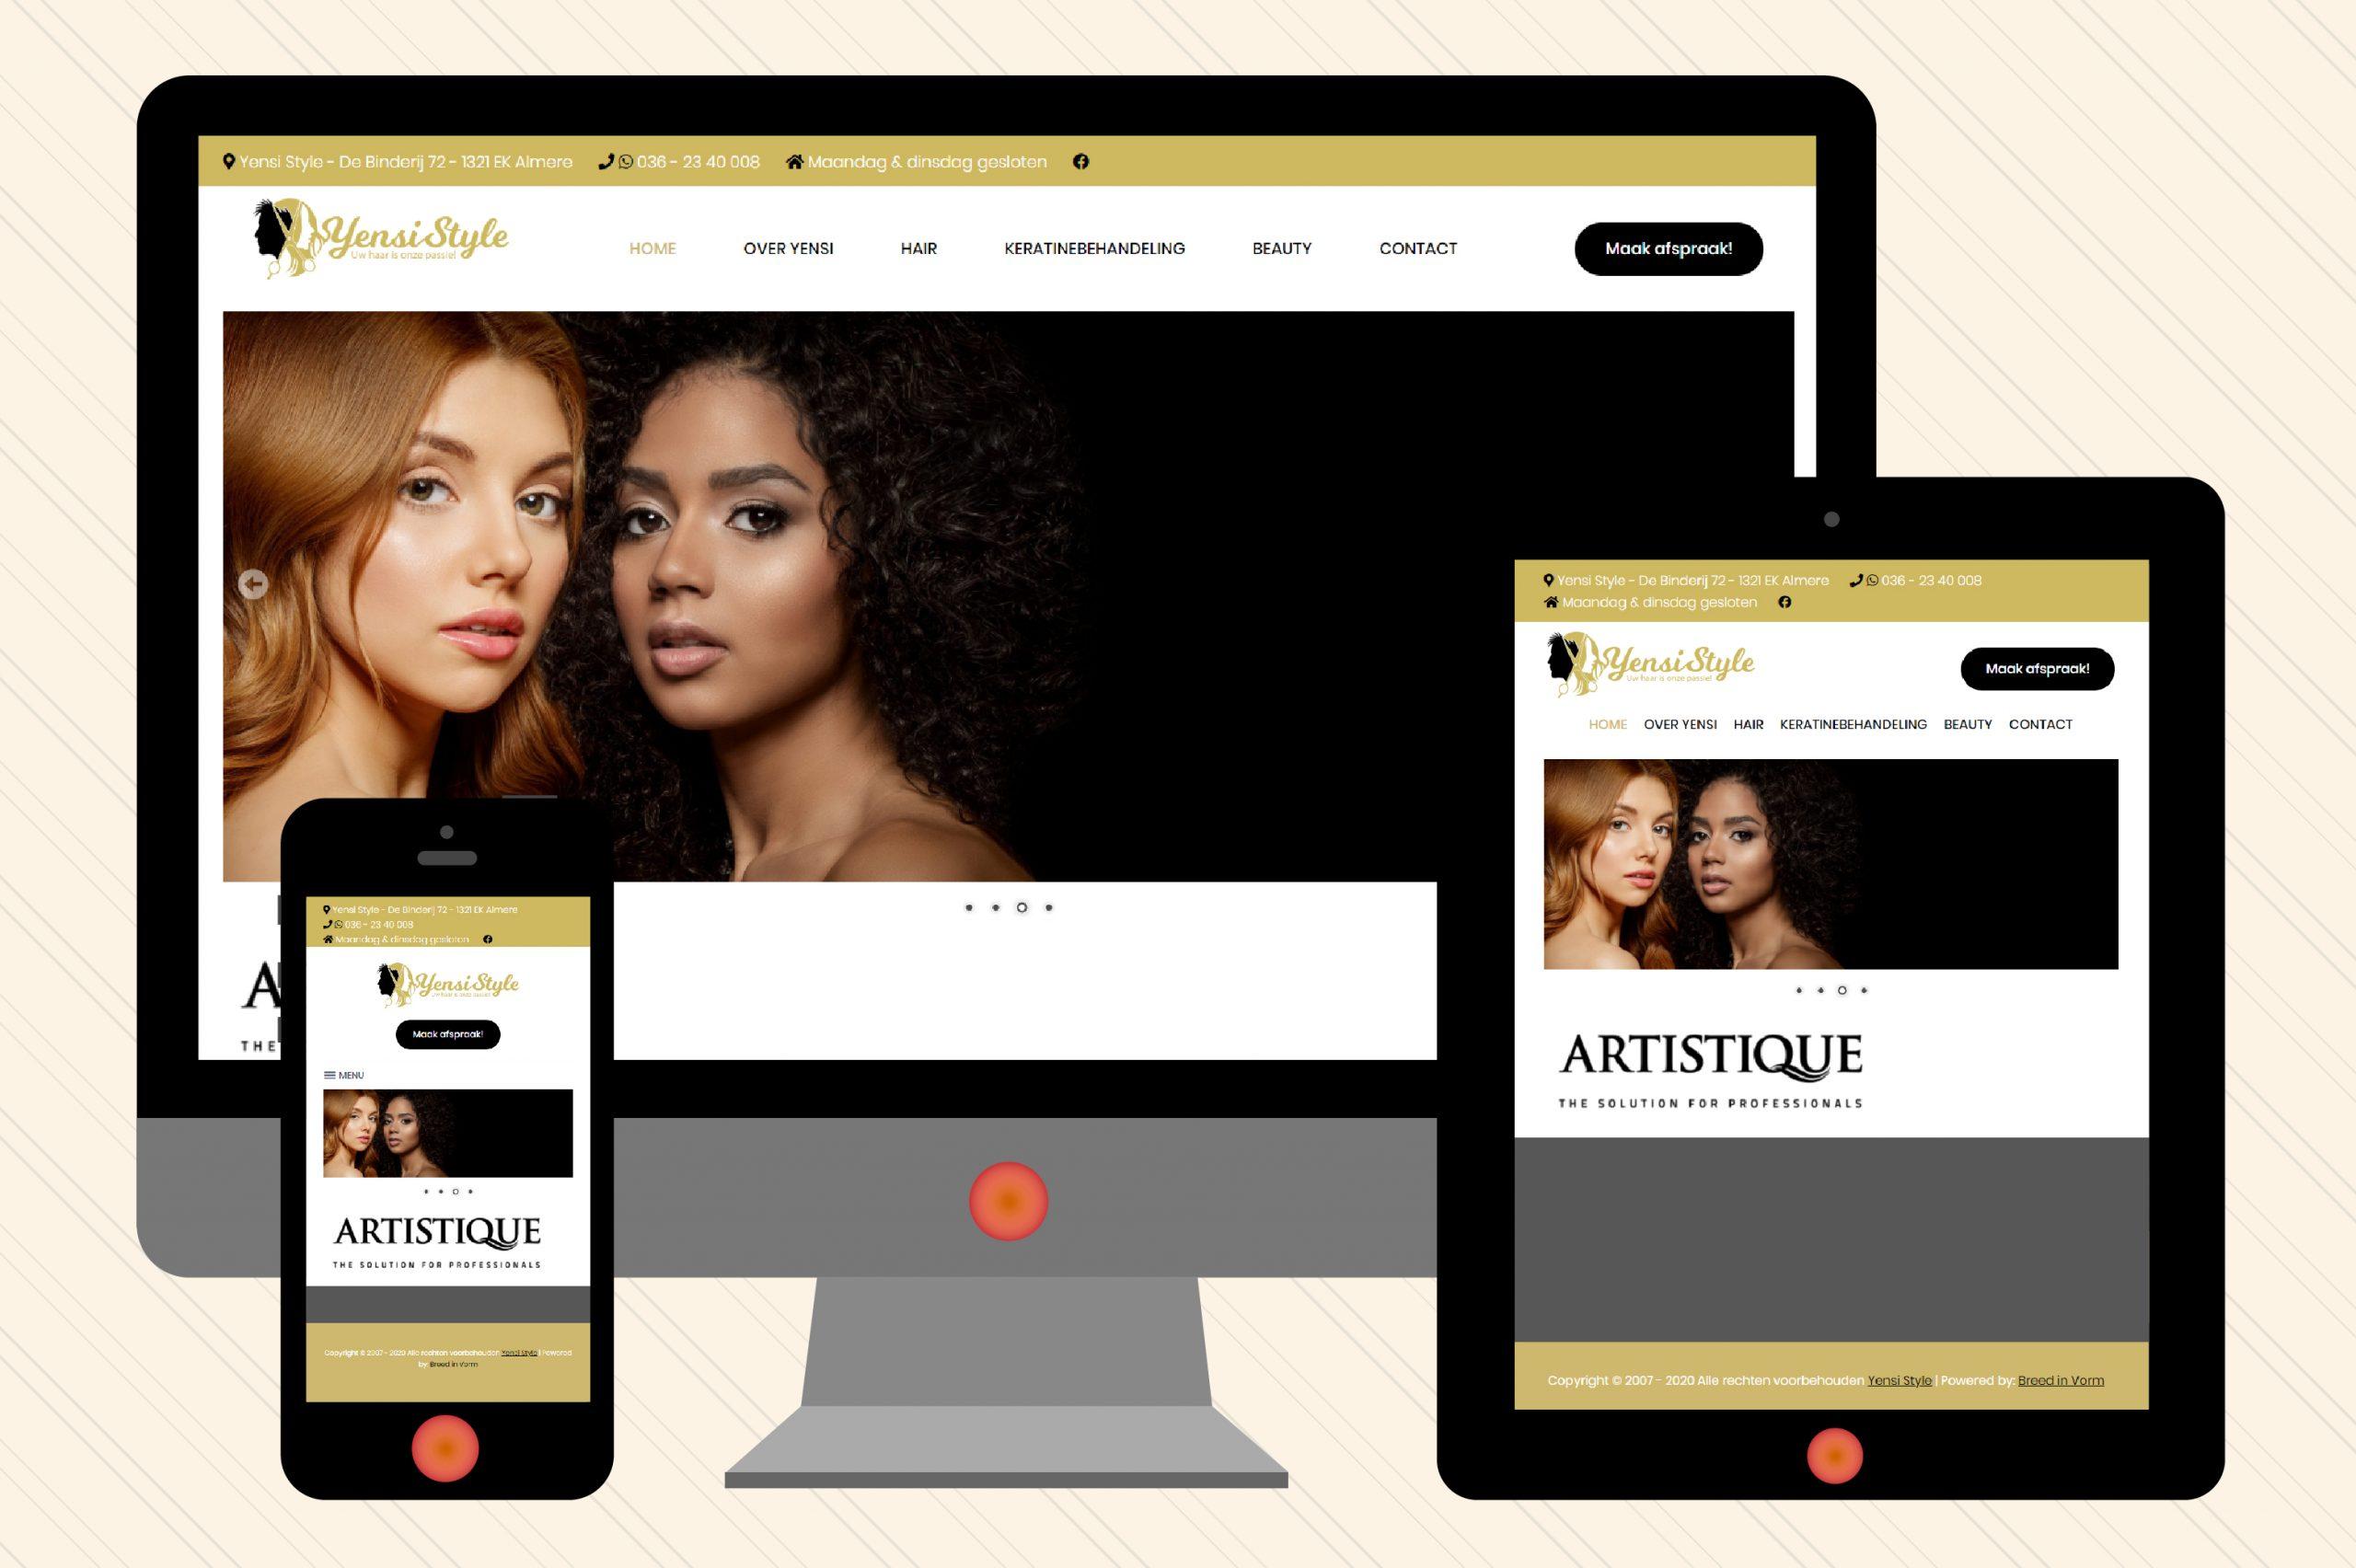 website yensi style breedinvorm.nl-01-01